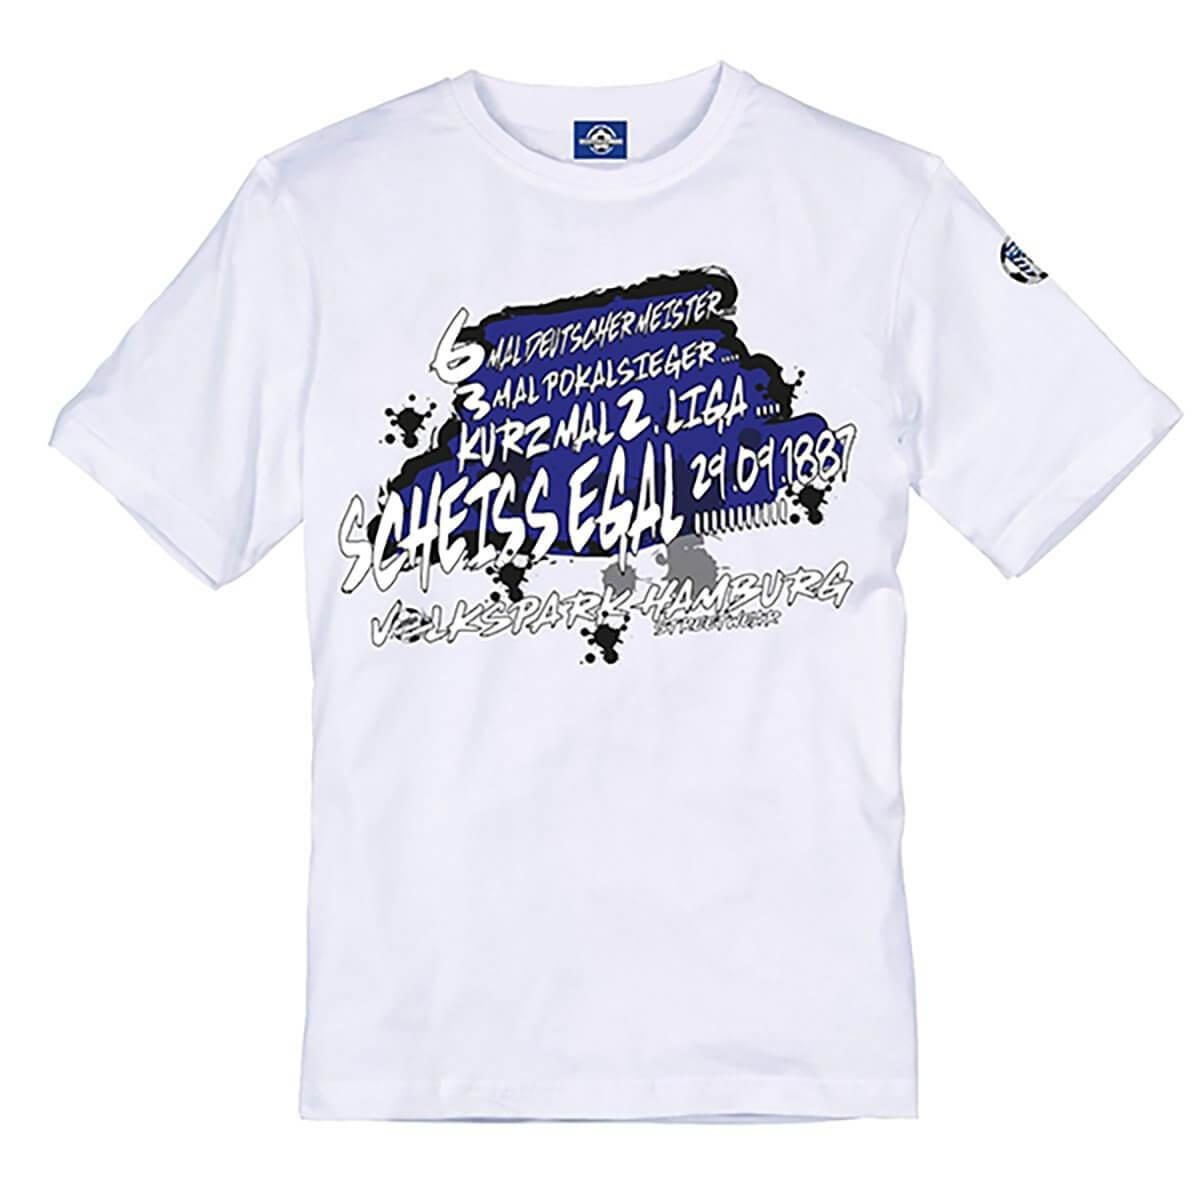 "7a7720c3f189b2 Herren Shirt ""Kurz mal 2. Liga"" – Volkspark Textil   Werbedruck"